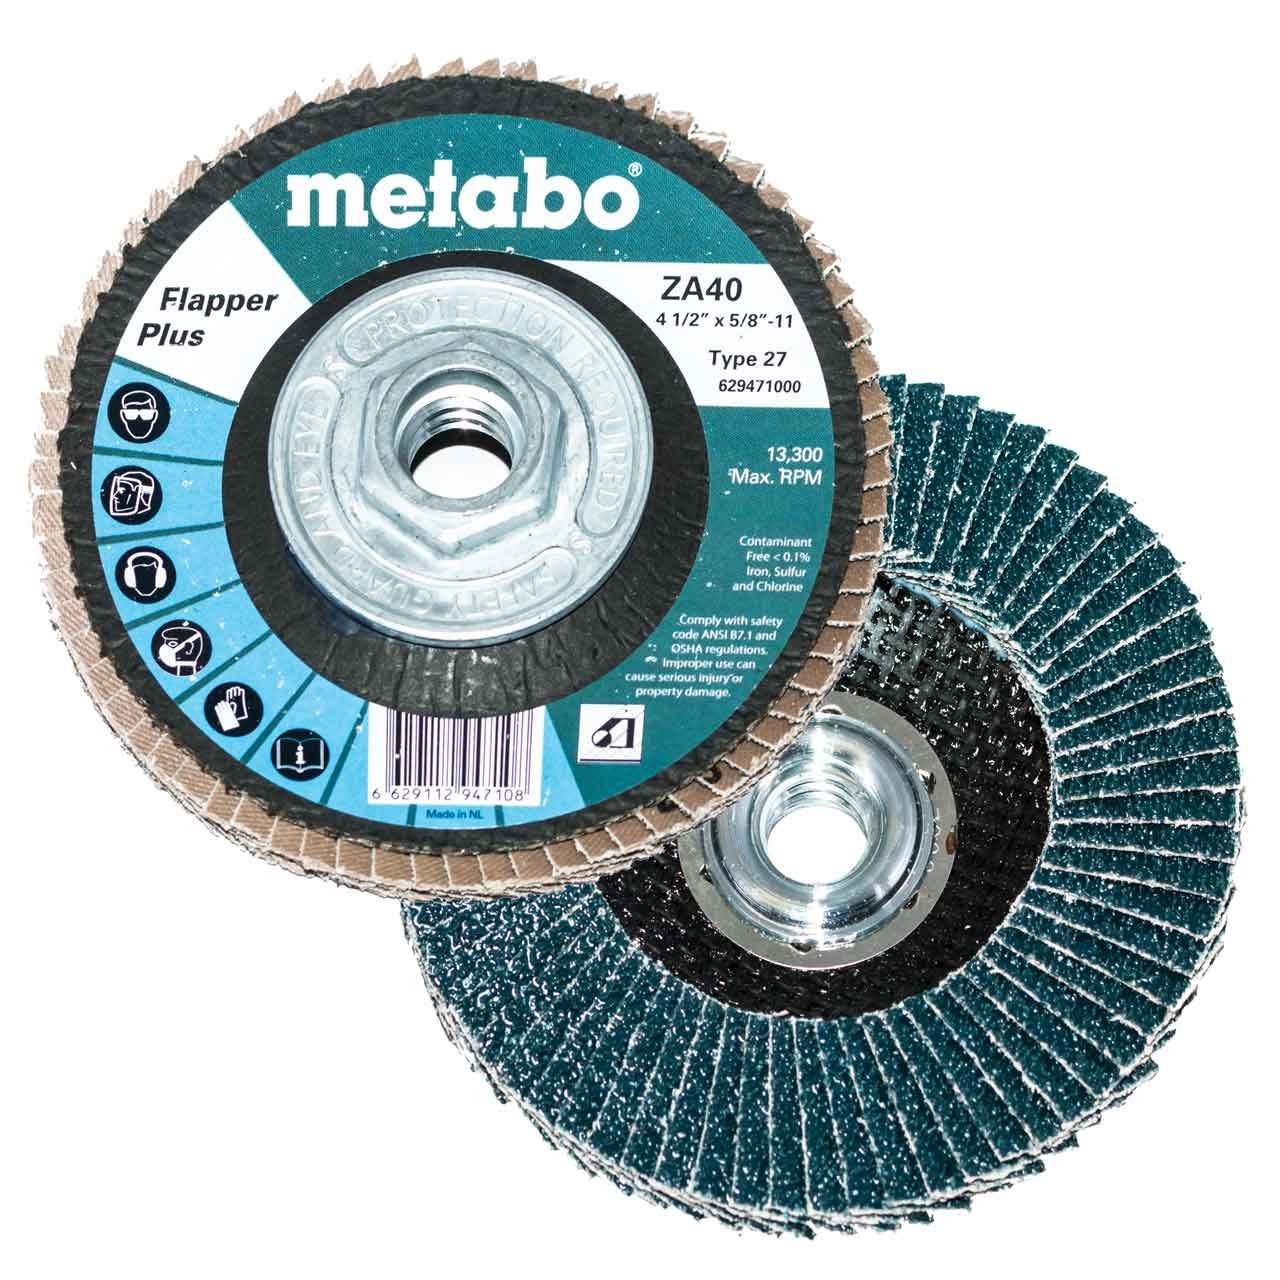 3 in Disc Dia Aluminum Oxide 8000 RPM Non-Woven Finishing Disc 40 Units